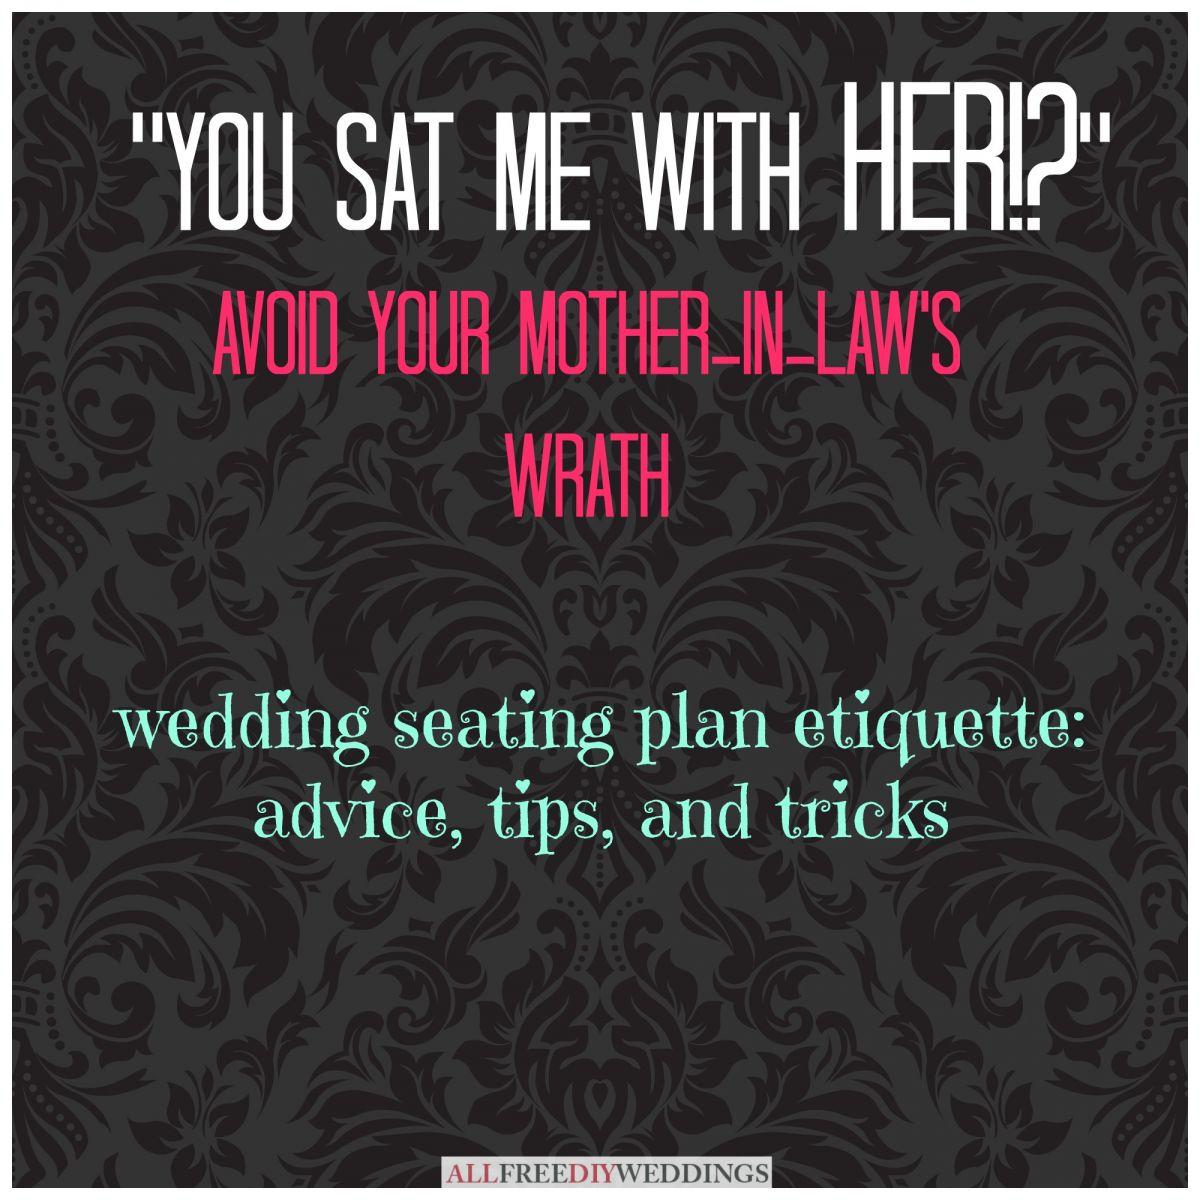 Wedding Seating Chart Freewordtemplates Net how to make a wedding – Guest Seating Chart Template